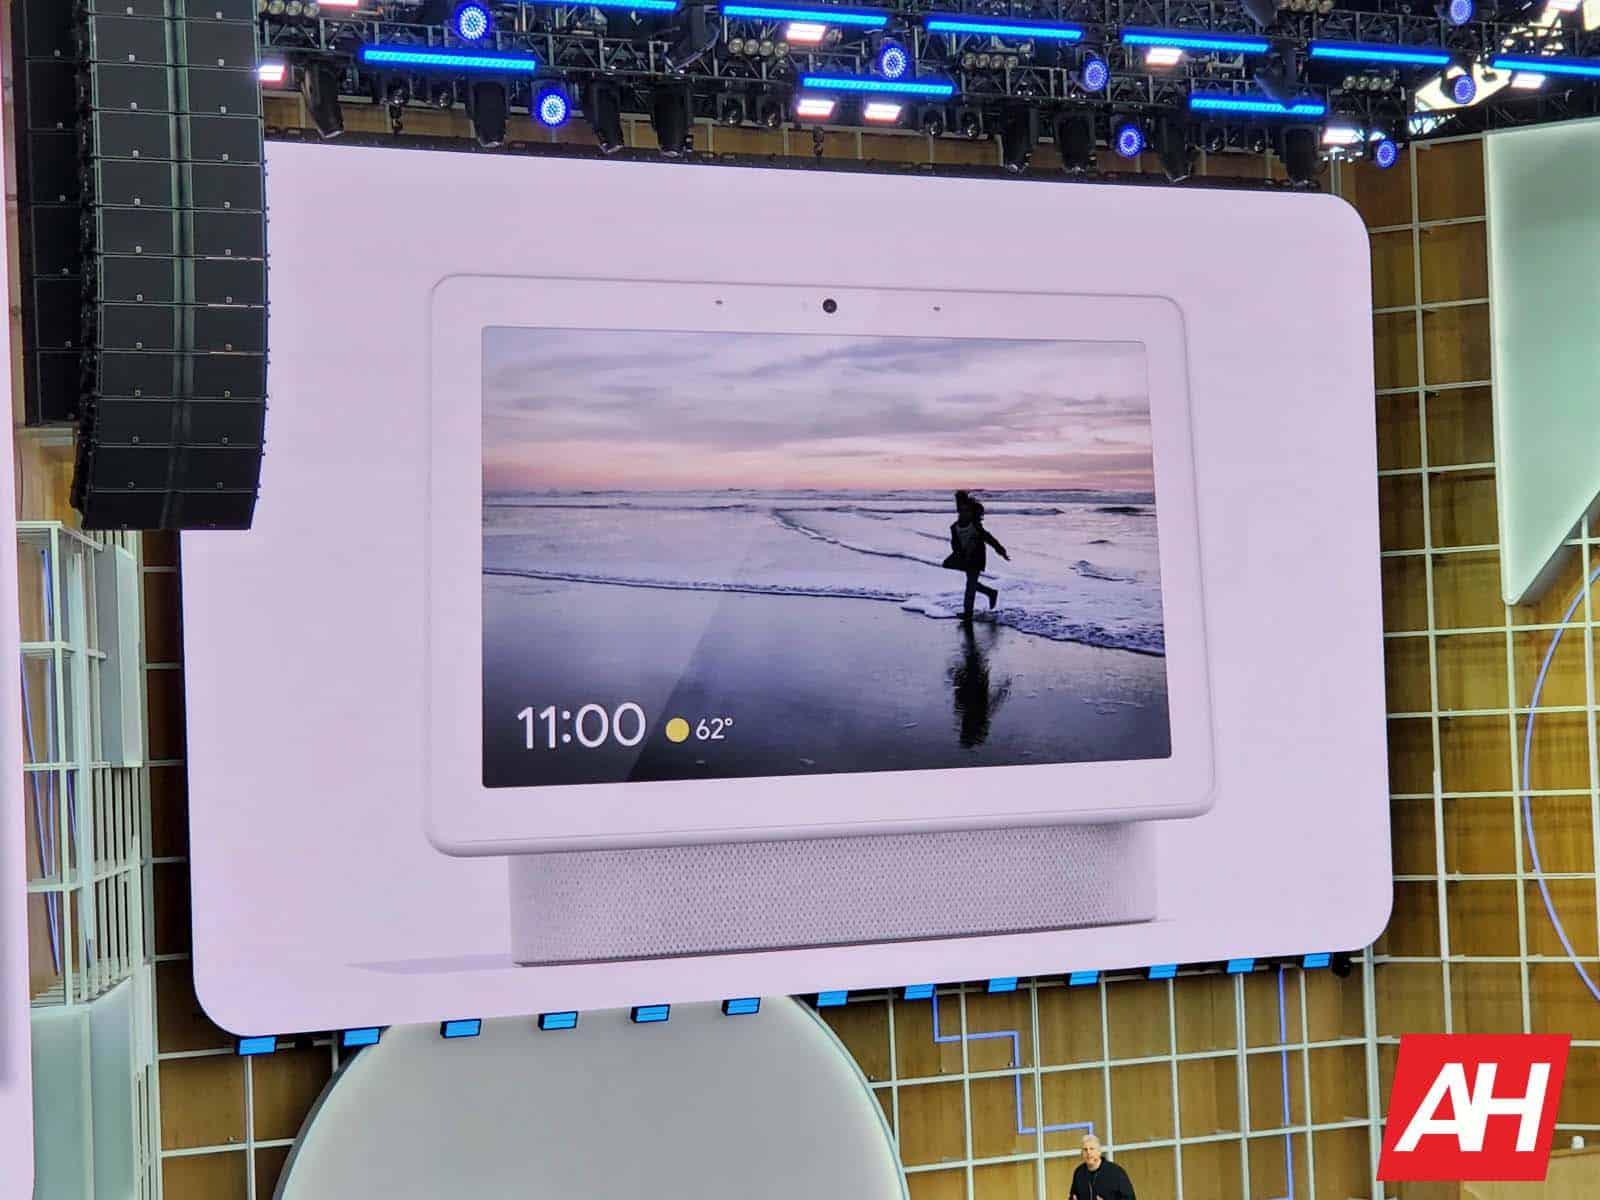 Google IO 2019 AH Keynote 02 22